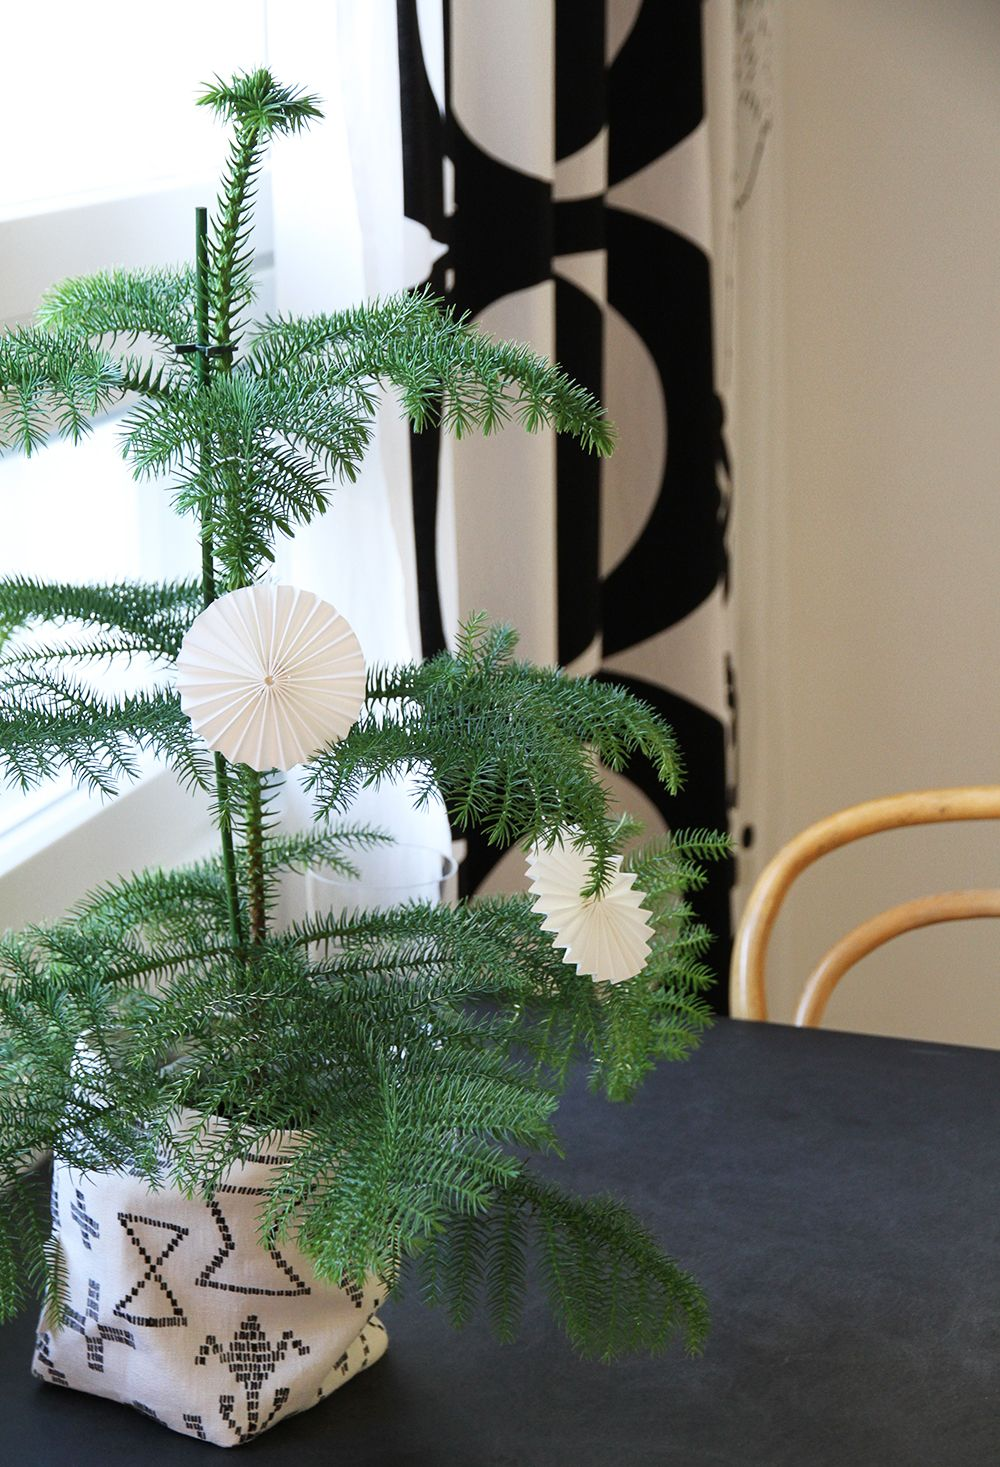 White paper ornaments.